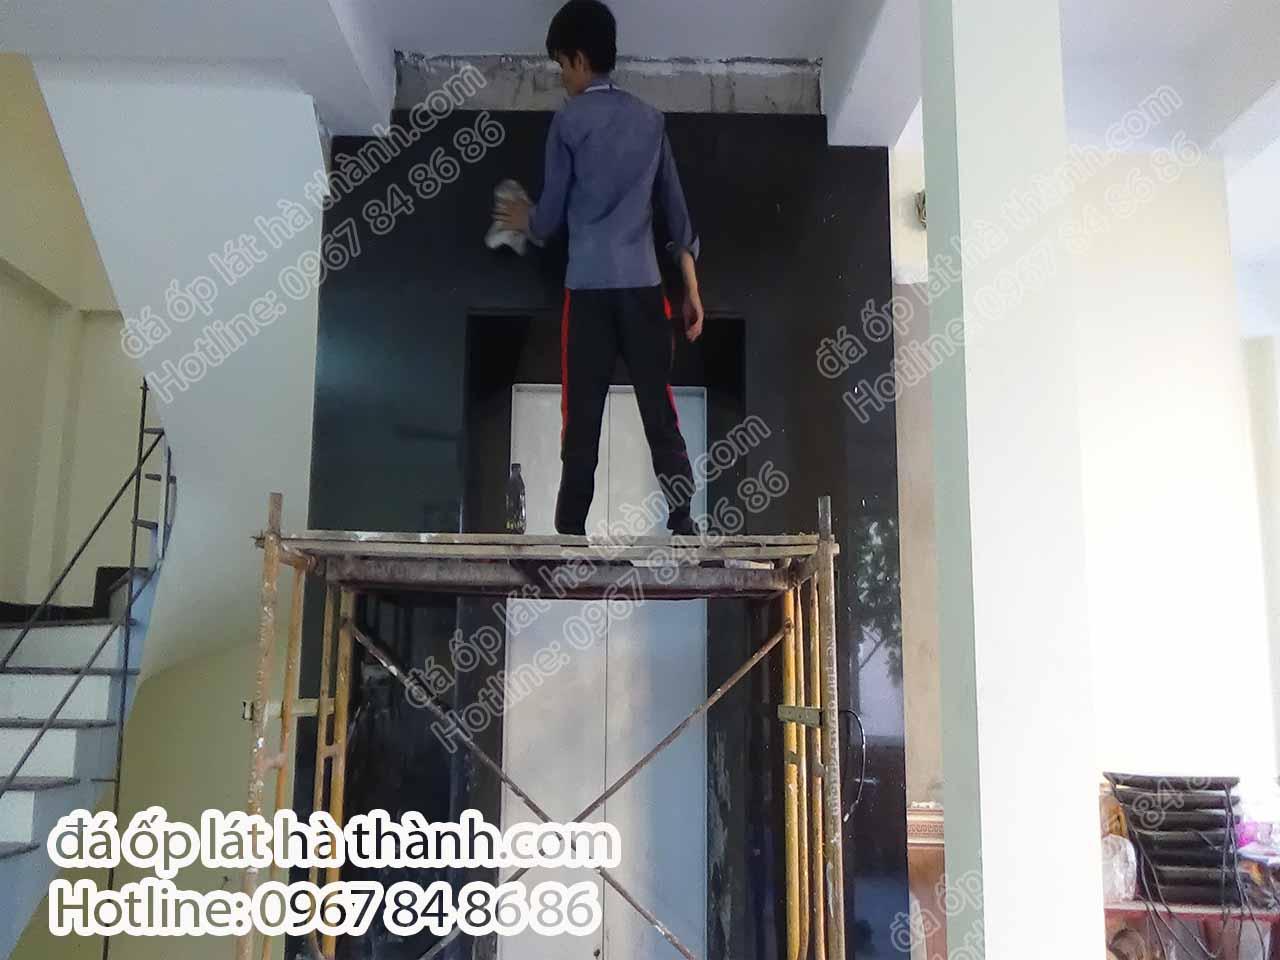 Đá kim sa ốp thang máy